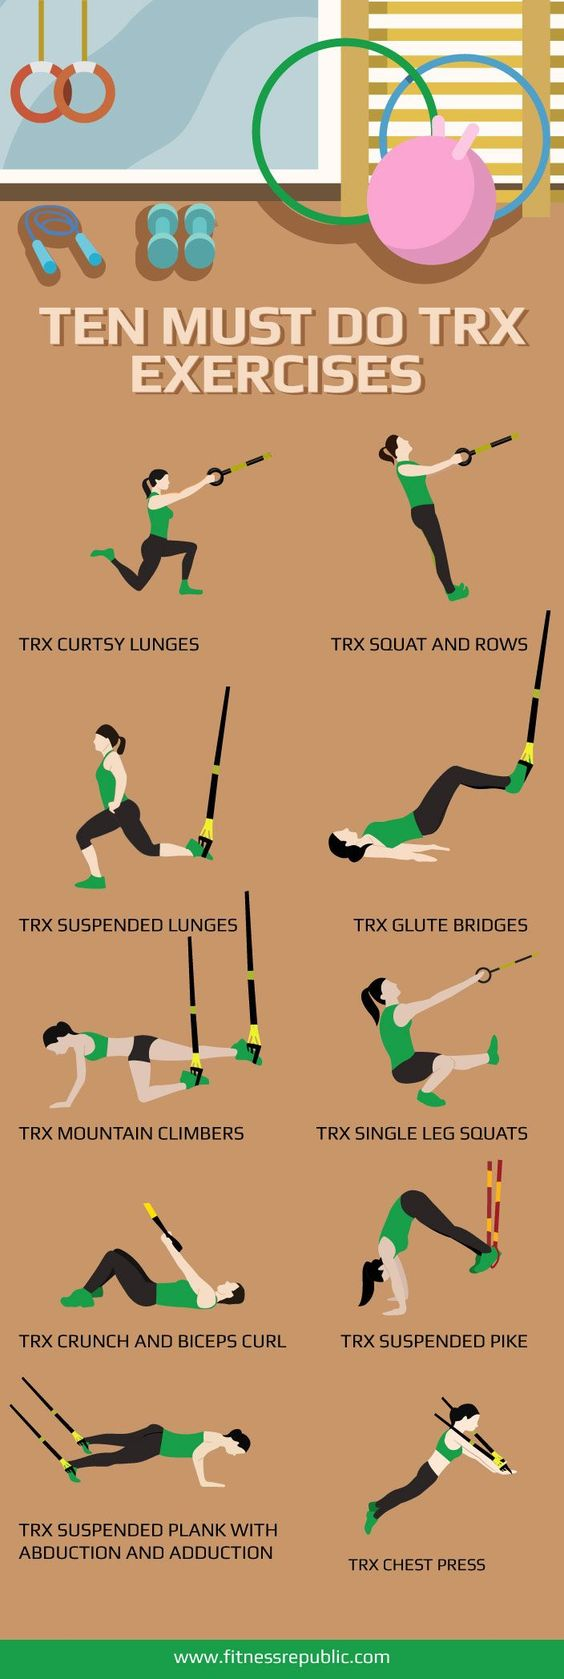 trx esercizi efficaci